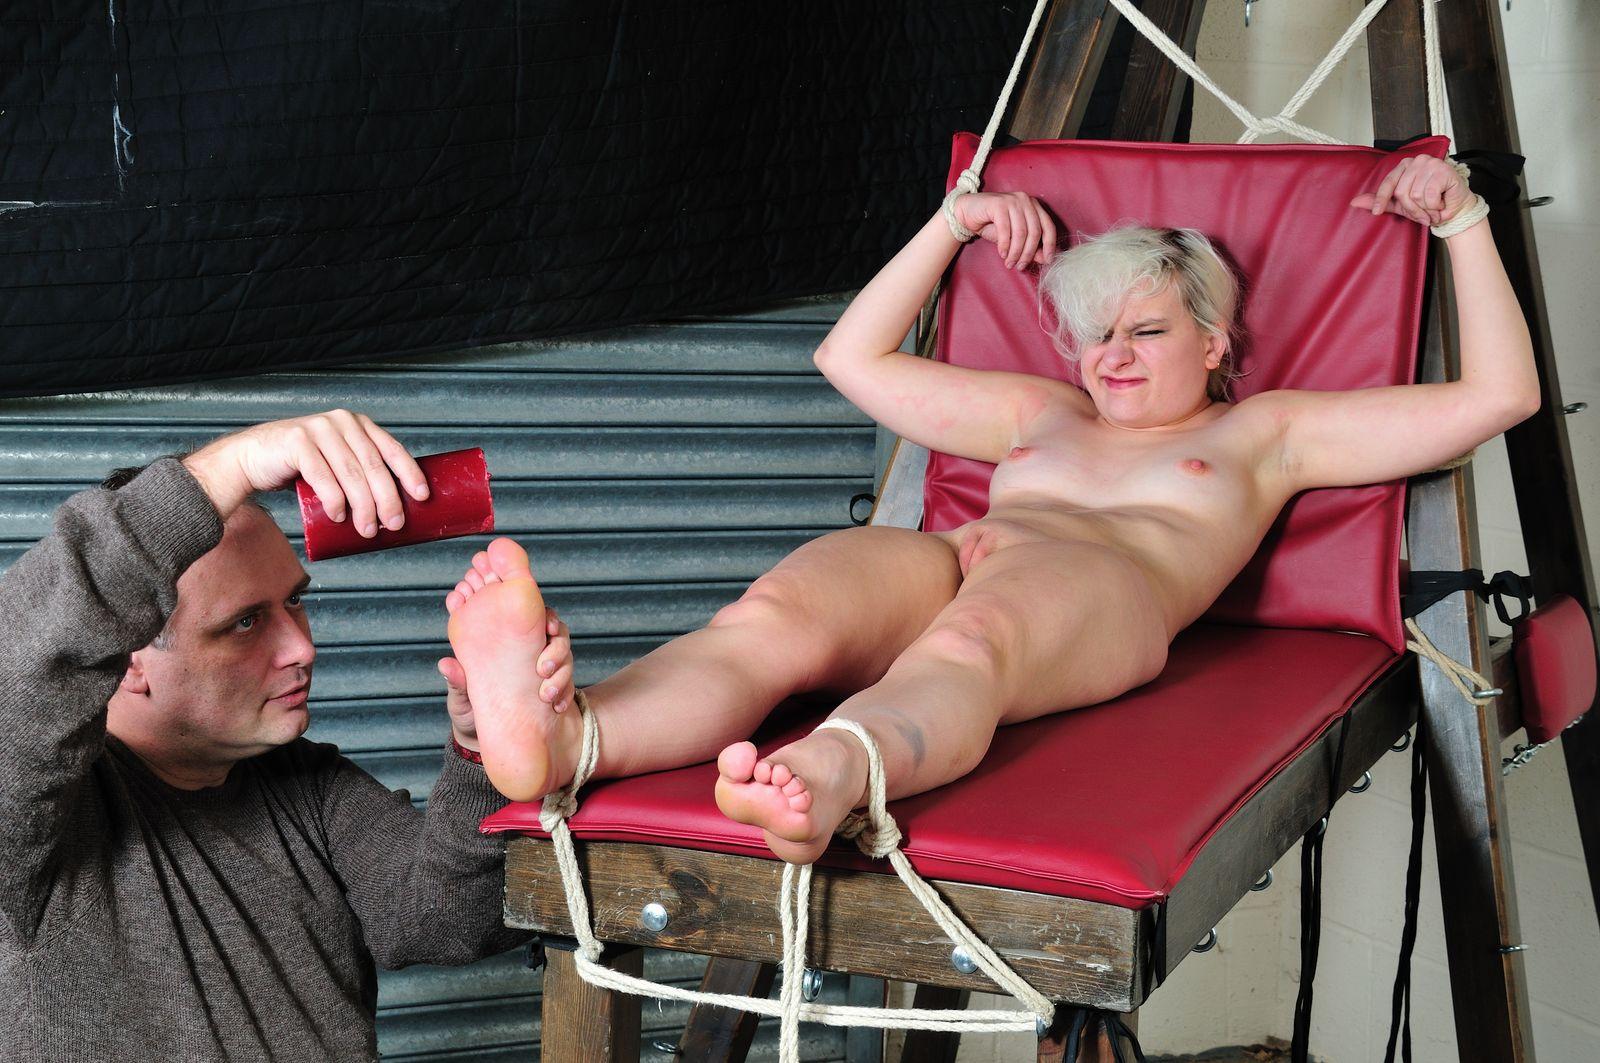 foot fetish bondage video